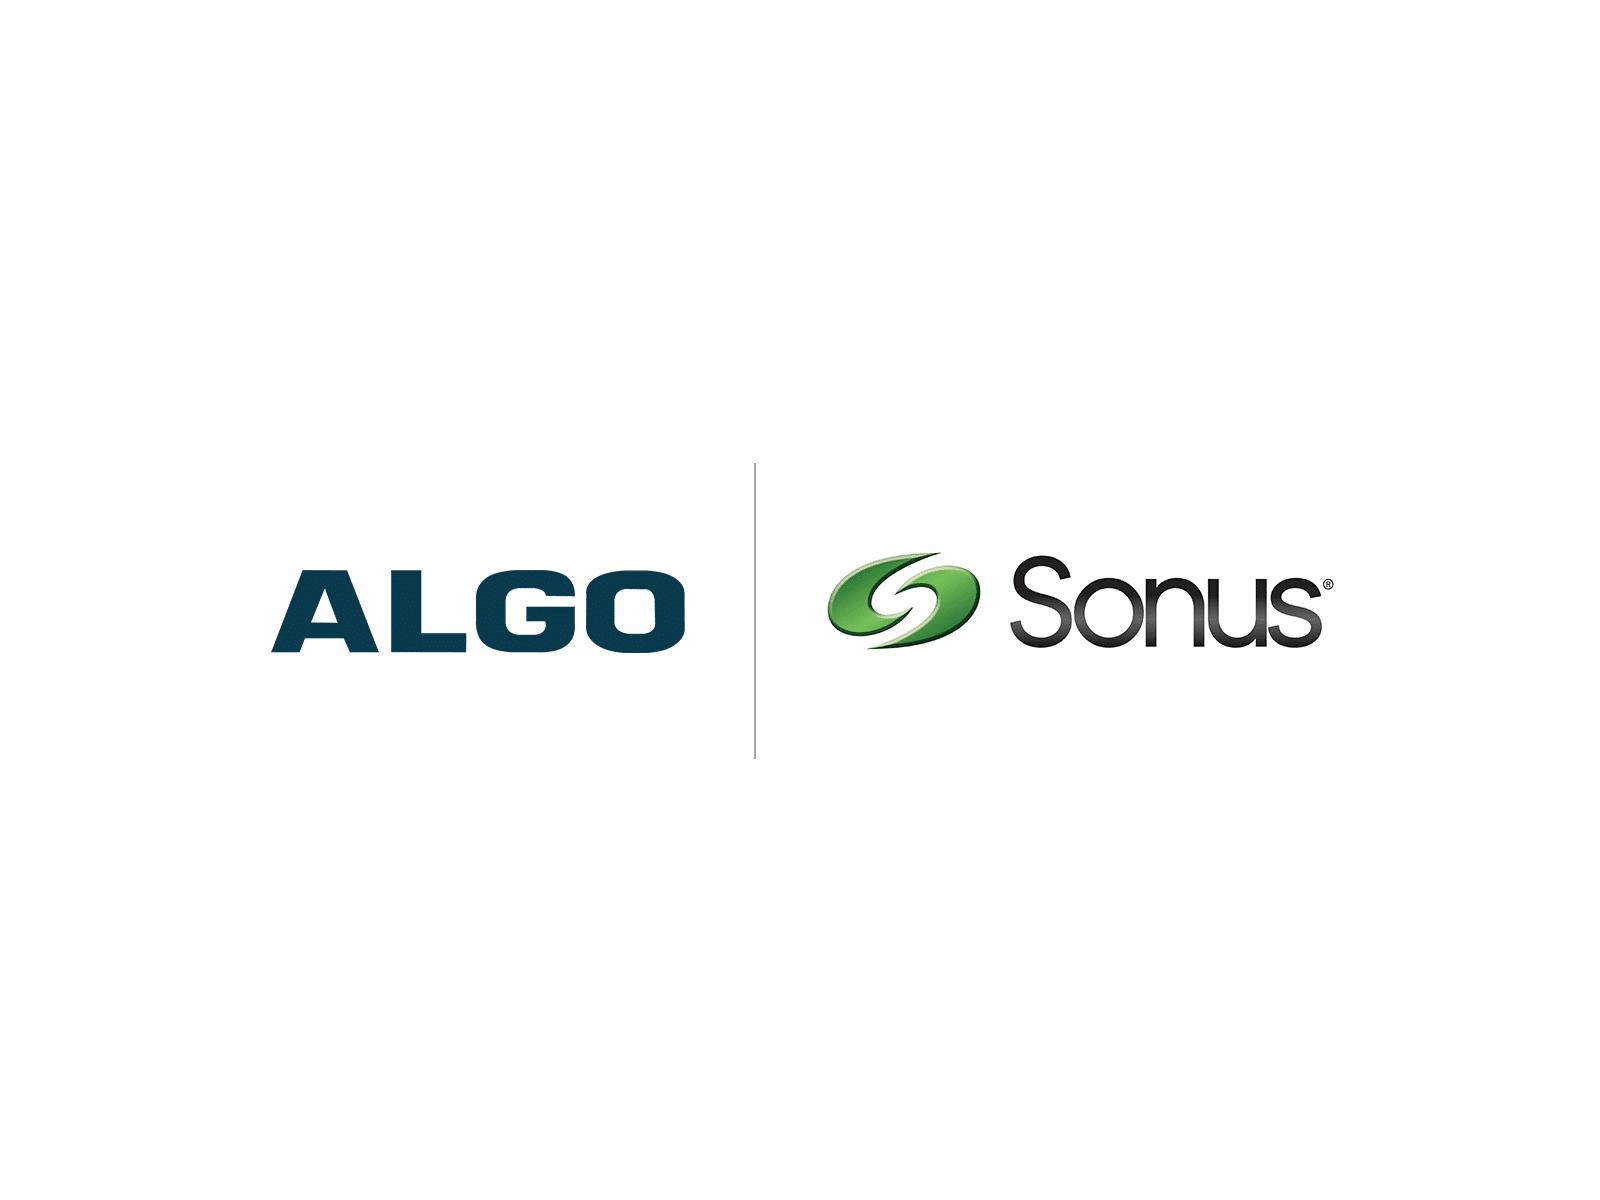 Algo Sonus Compatibility Logo